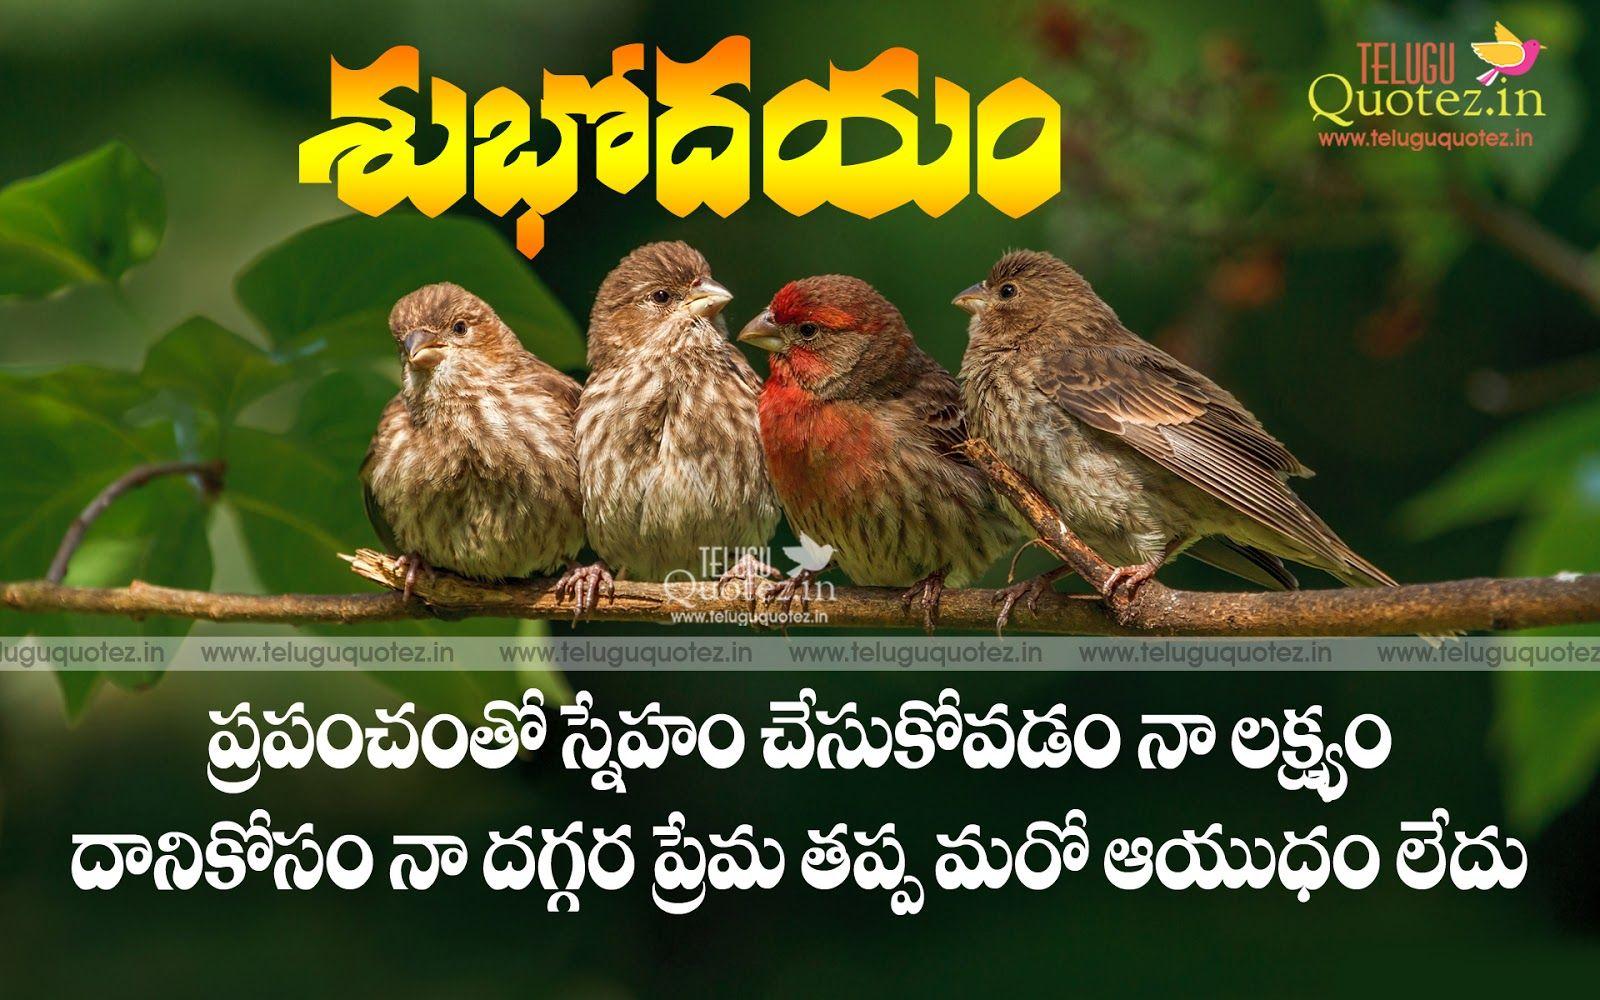 Good Morning Life Quotes In Telugu Quotes Images Free Teluguquotez